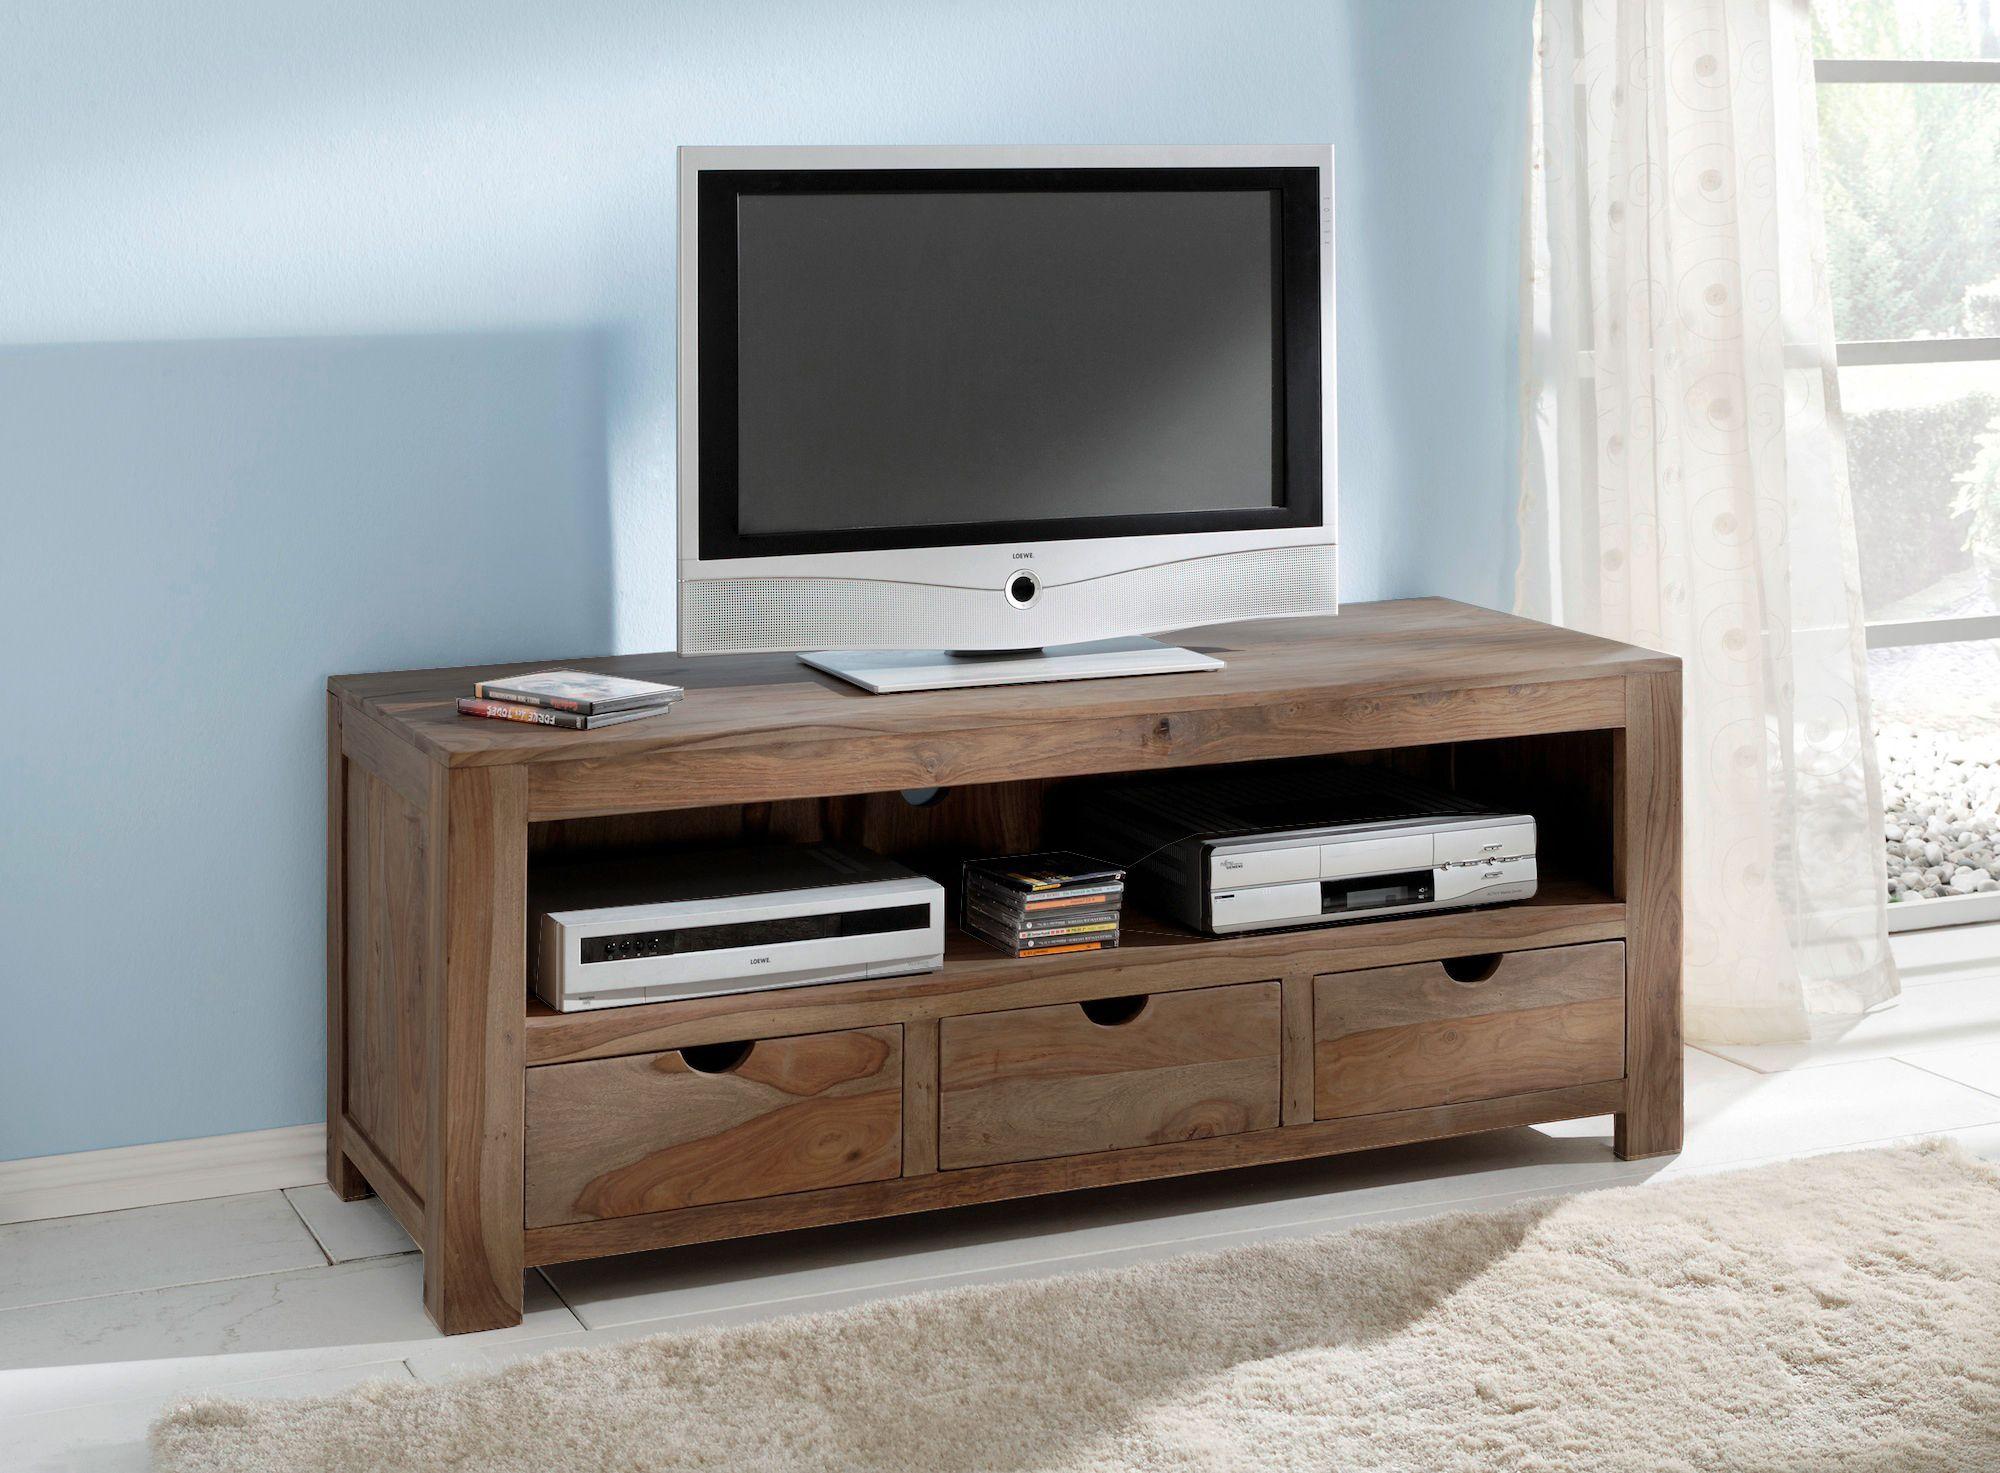 wolf m bel 6552nu yoga nugat tv szafka pod telewizor z 3 szufladami drewno palisander nugat. Black Bedroom Furniture Sets. Home Design Ideas